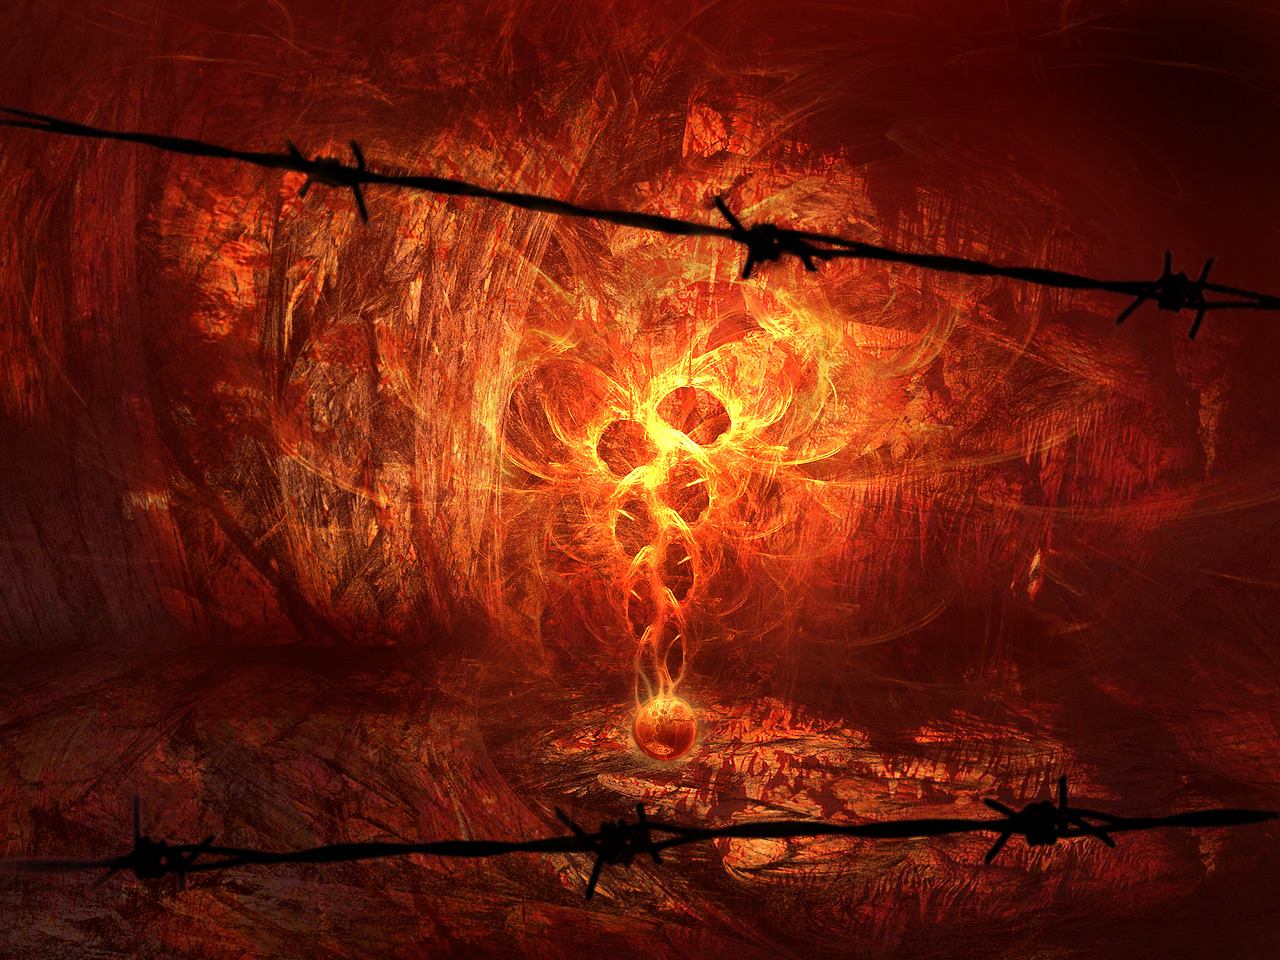 Fire Wallpaper Black Magic Hd Desktop Wallpapers 4k